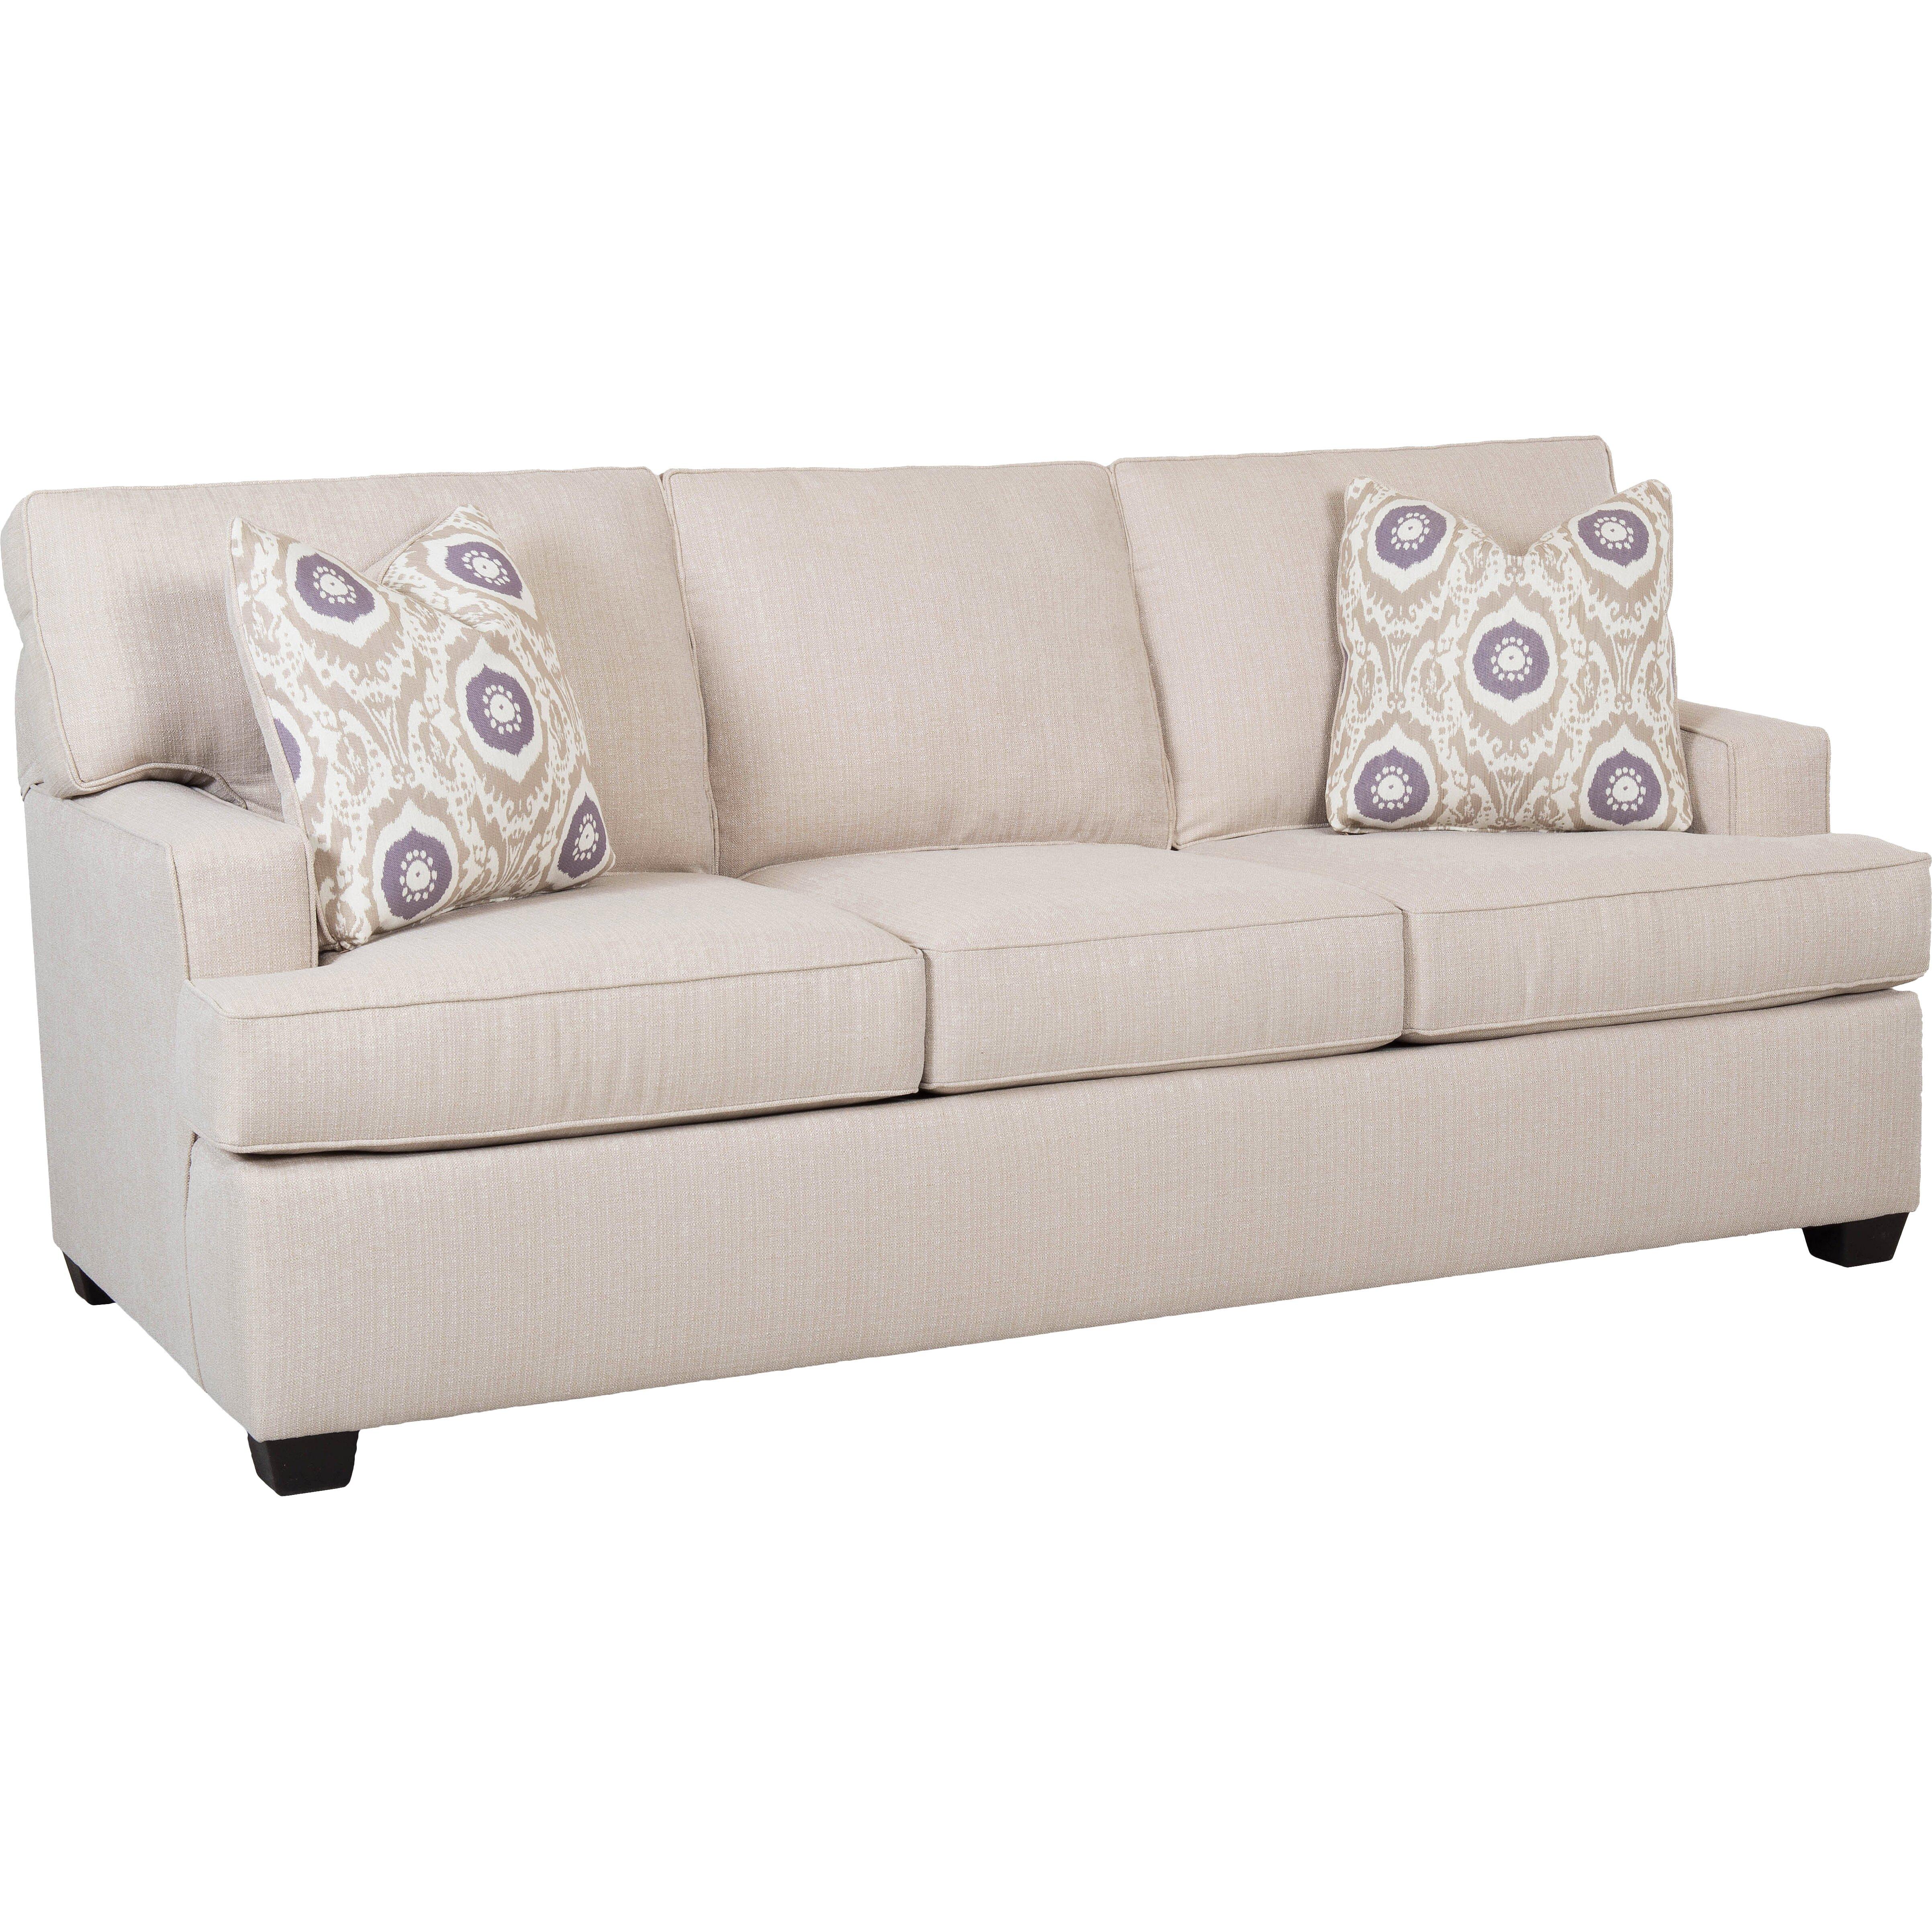 Klaussner Furniture Katie Sofa amp Reviews Wayfair : Cruze Sofa from www.wayfair.com size 4809 x 4809 jpeg 3516kB